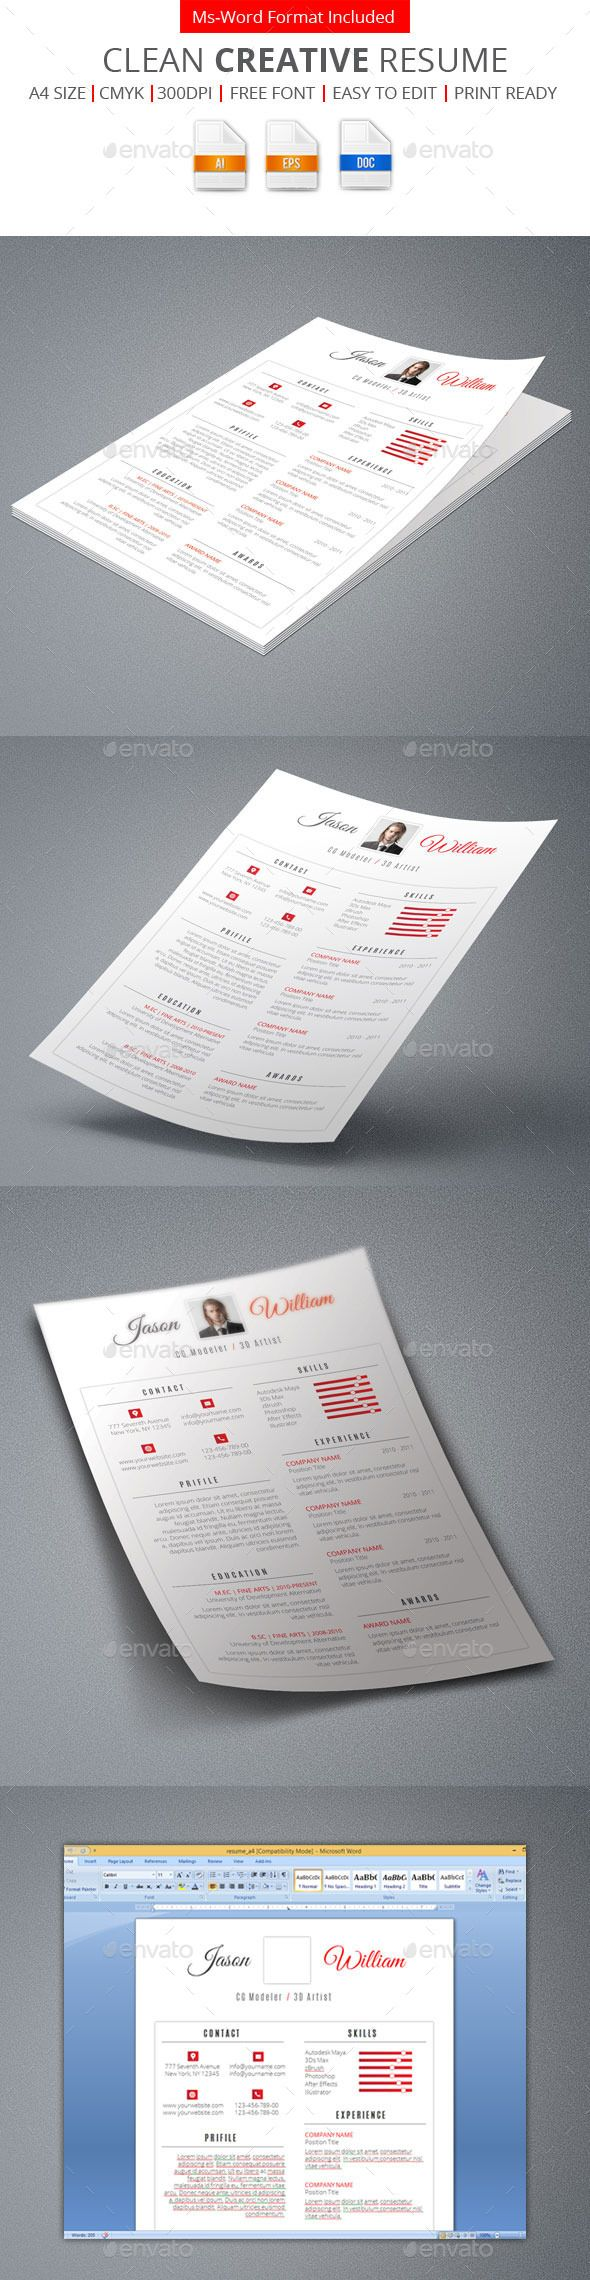 free creative resume templates%0A Clean Creative Resume